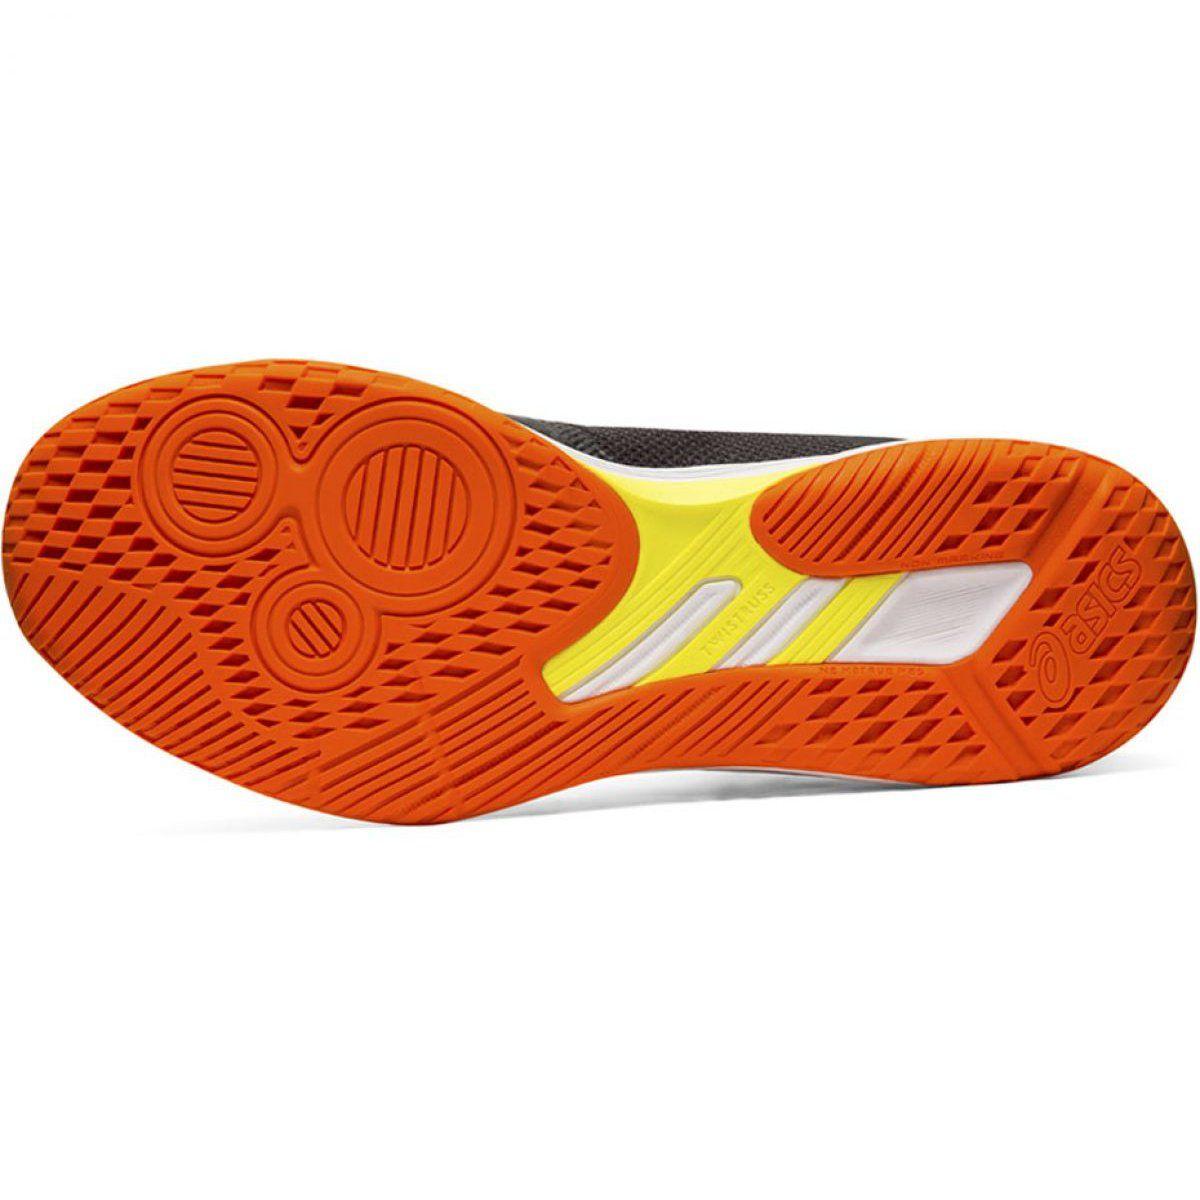 Buty Do Siatkowki Asics Netburner Ballistic Ff Mt M 1051a003 003 Czarne Czarne Volleyball Shoes Mens Volleyball Shoes Asics Volleyball Shoes